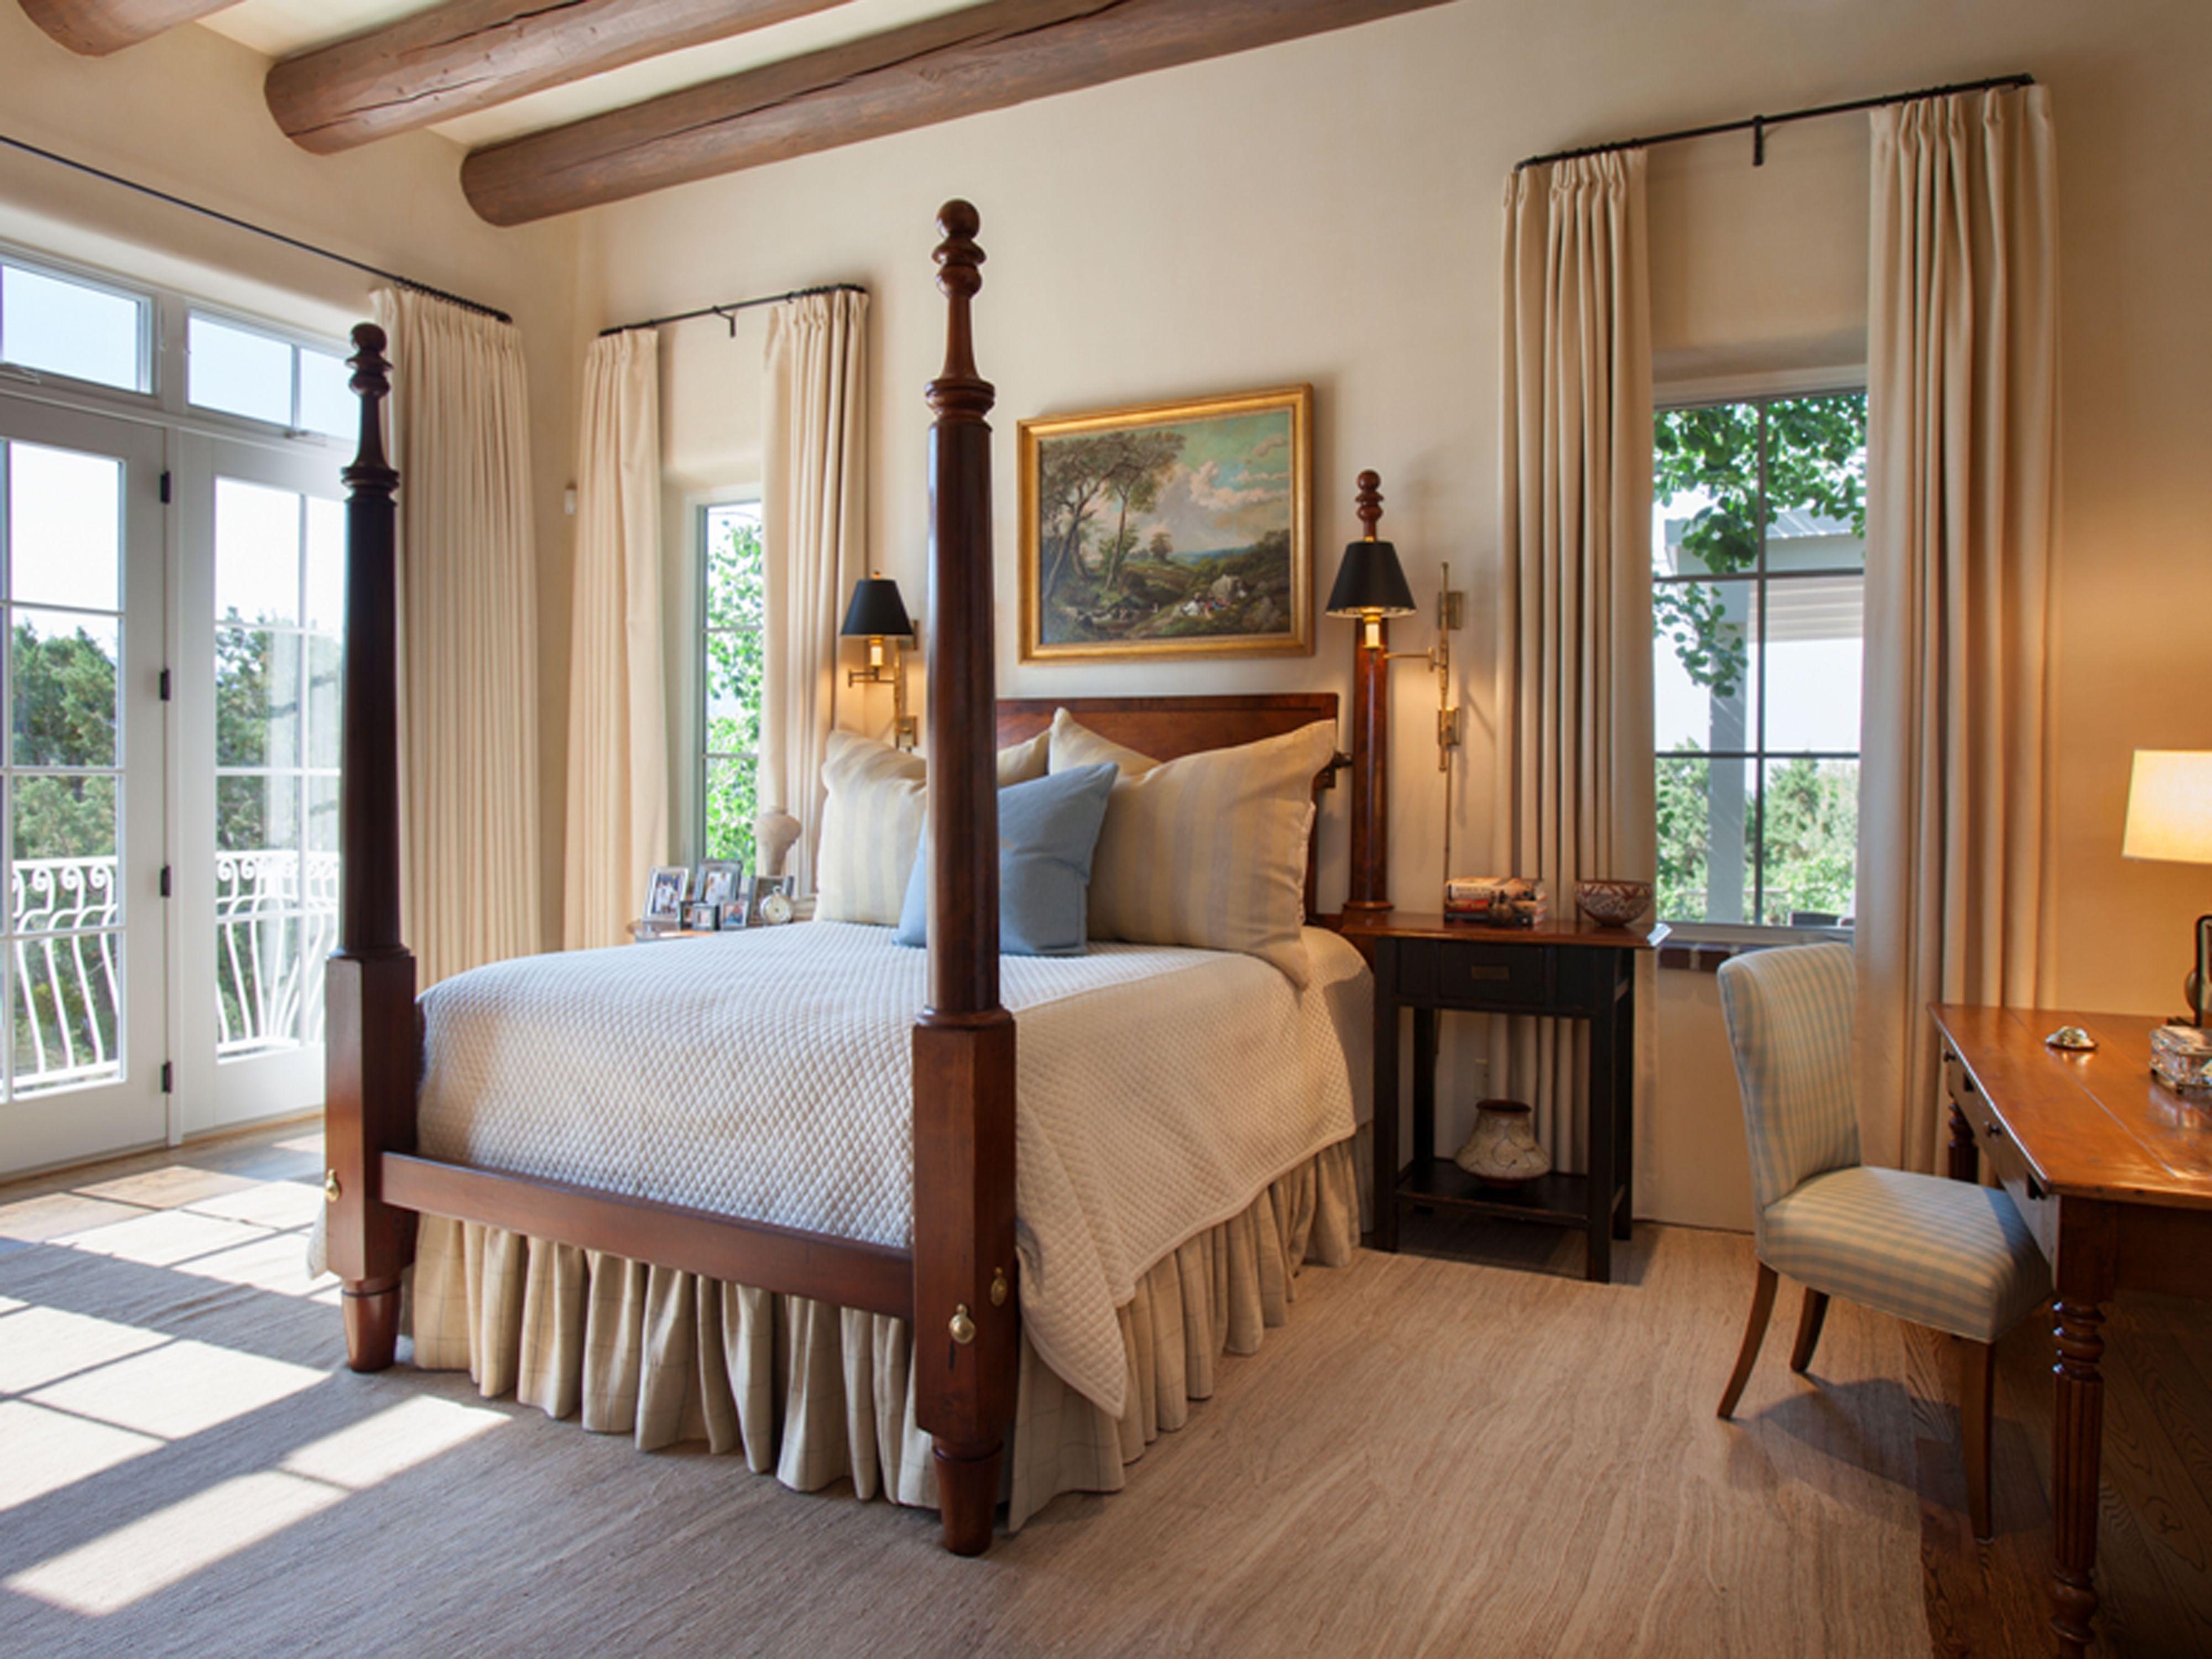 Santa Fe New Mexico Adobe Home - Southwestern Decorating Ideas on